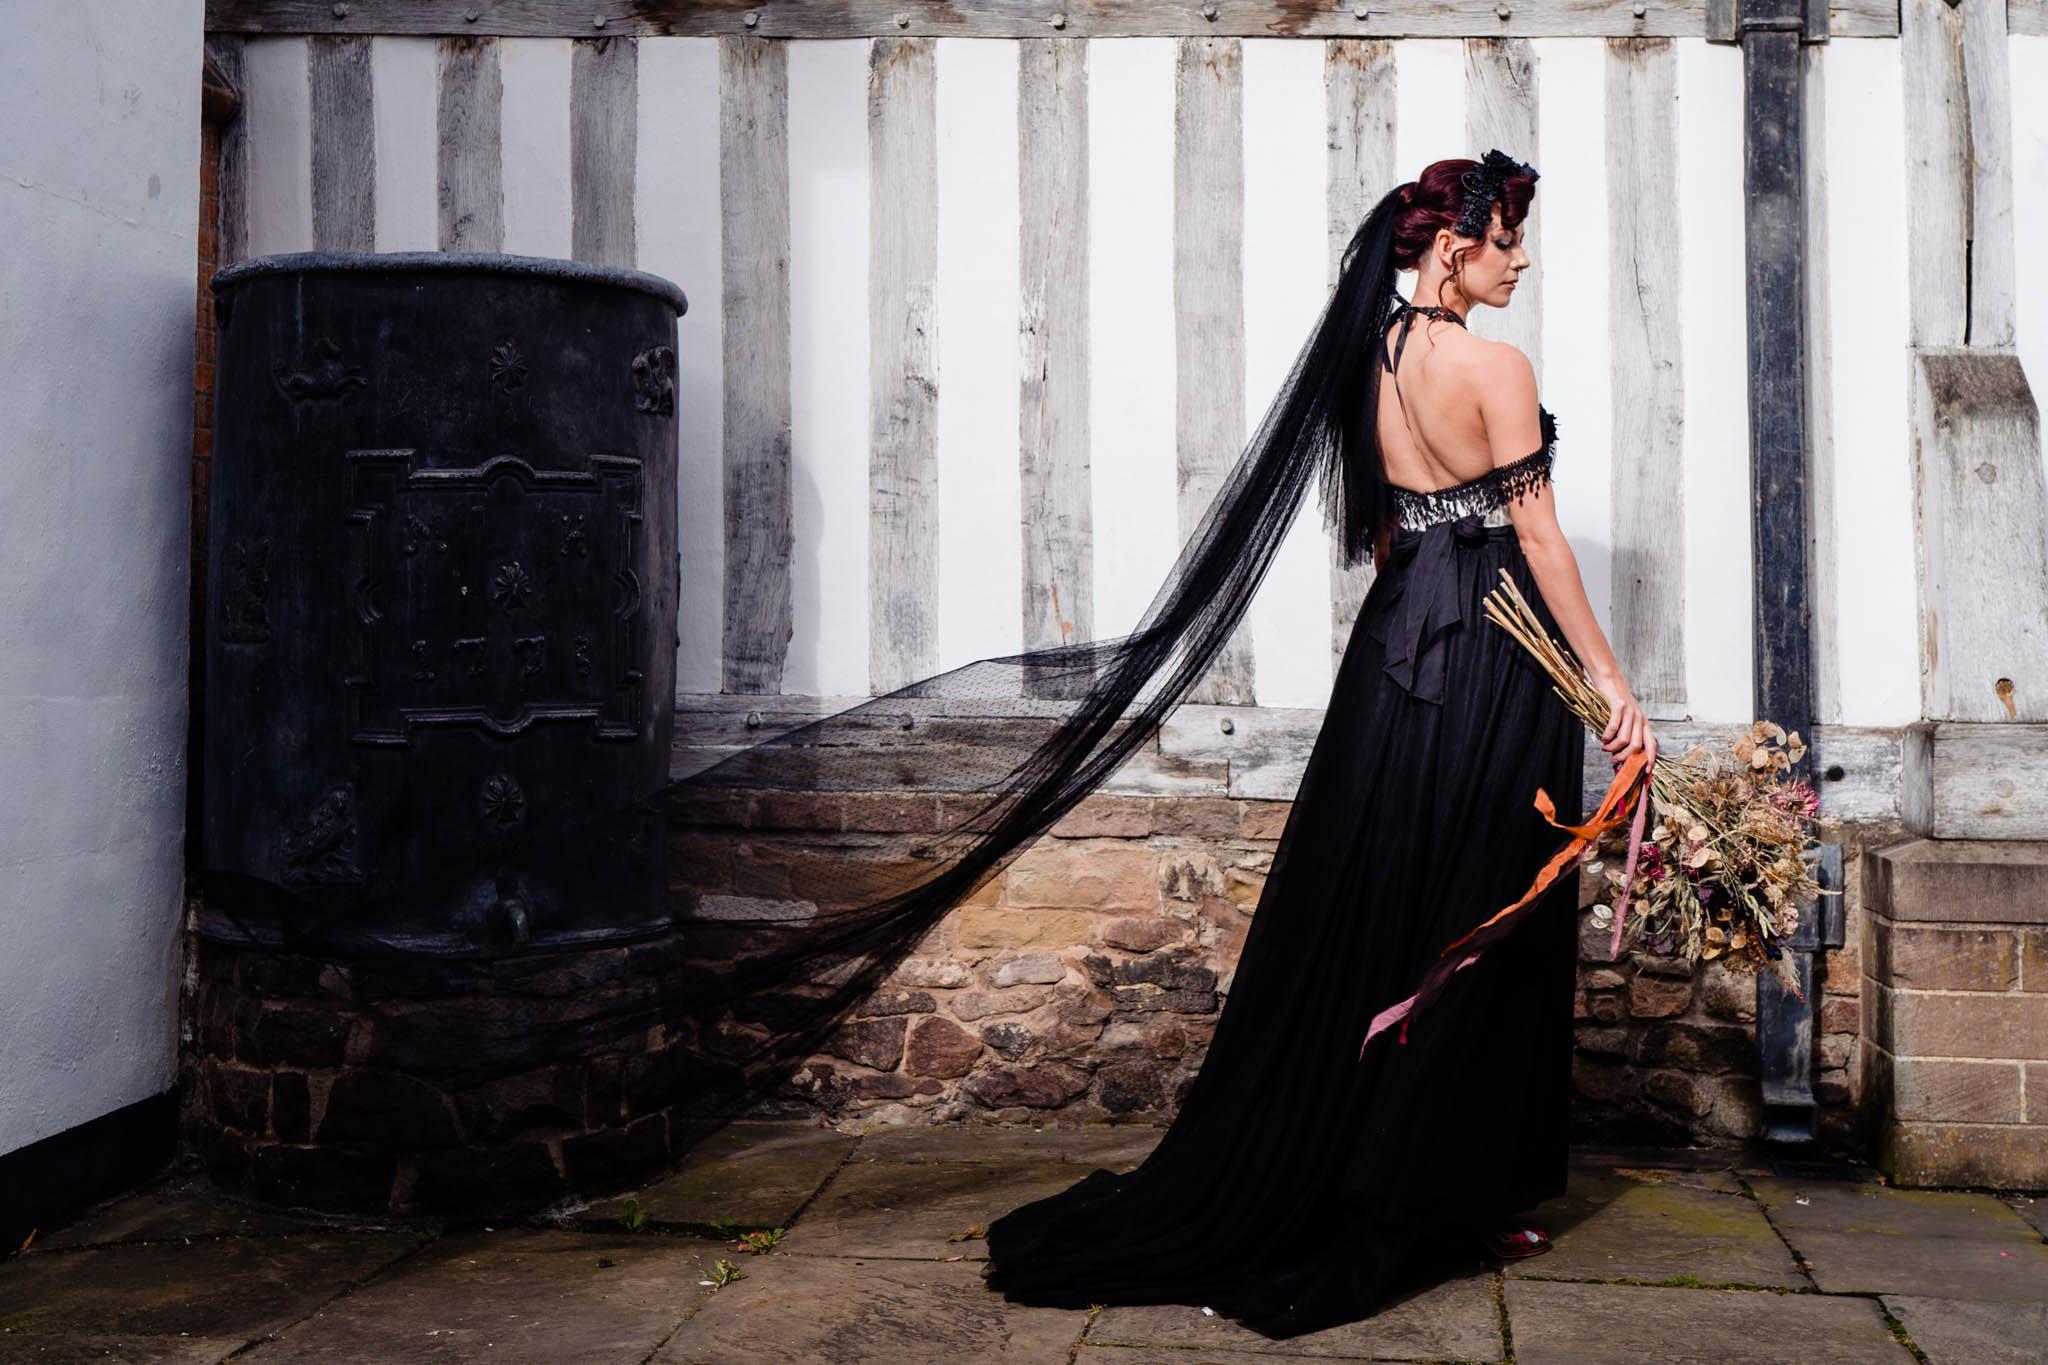 black wedding veil - black veil - black wedding dress - gothic bride - gothic wedding dress